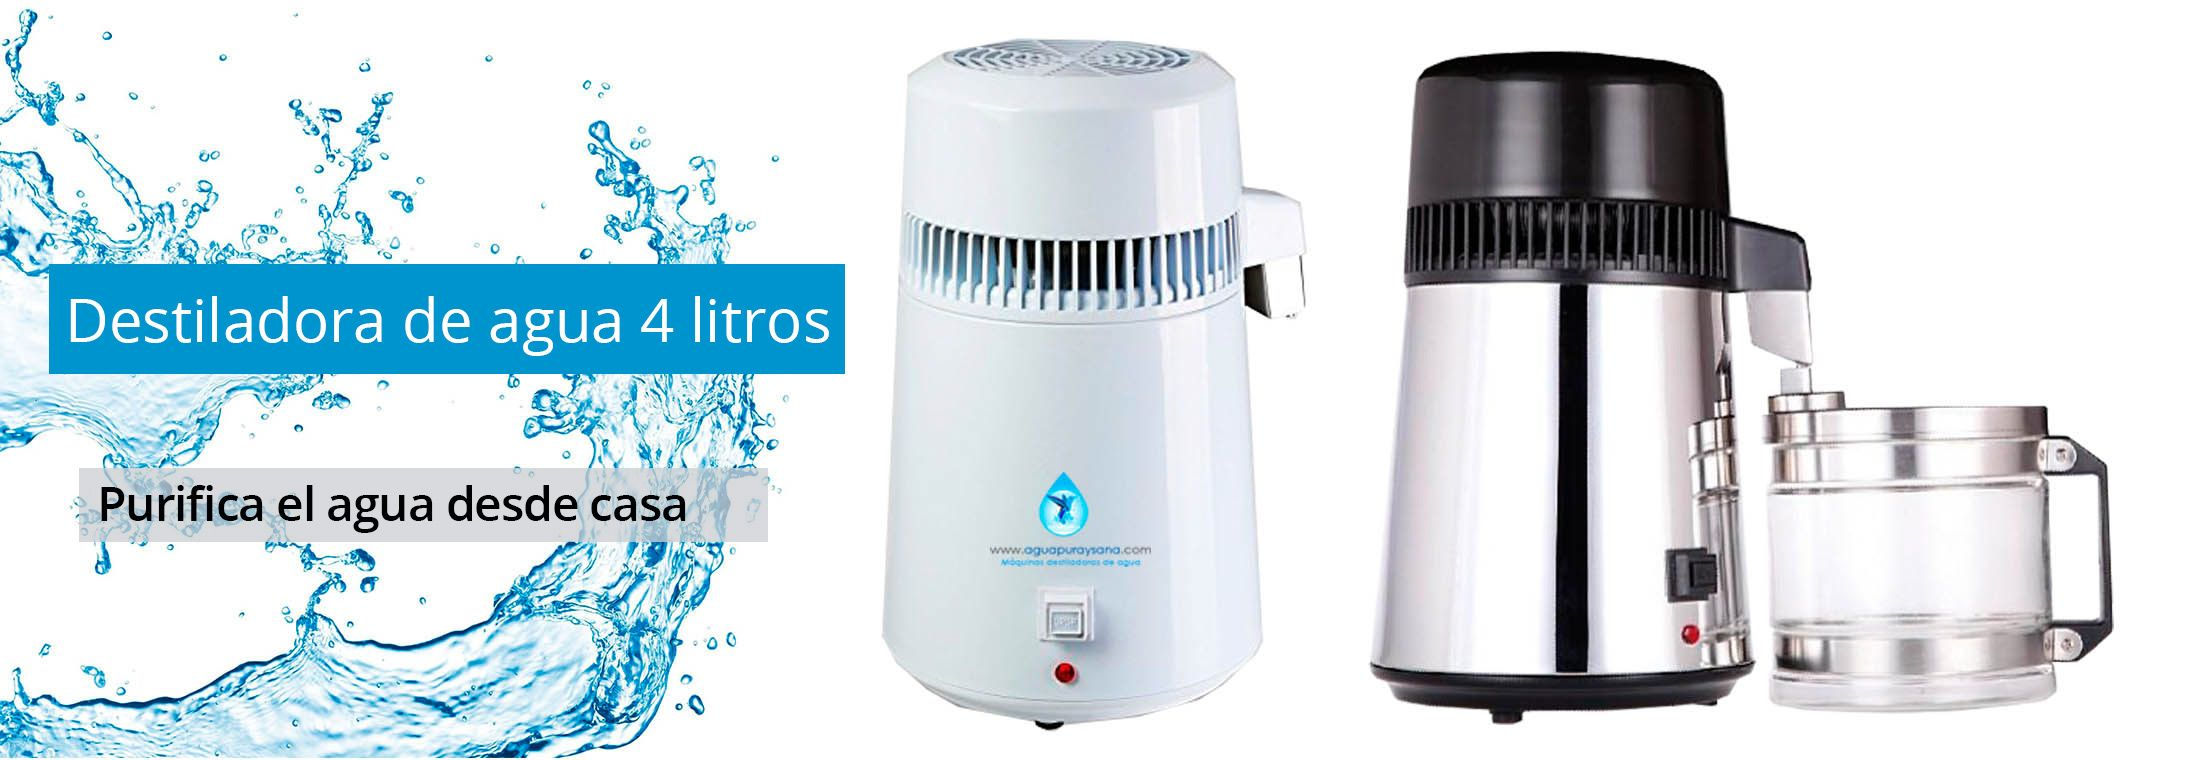 Destiladoras Maquina De Agua Agua Potable